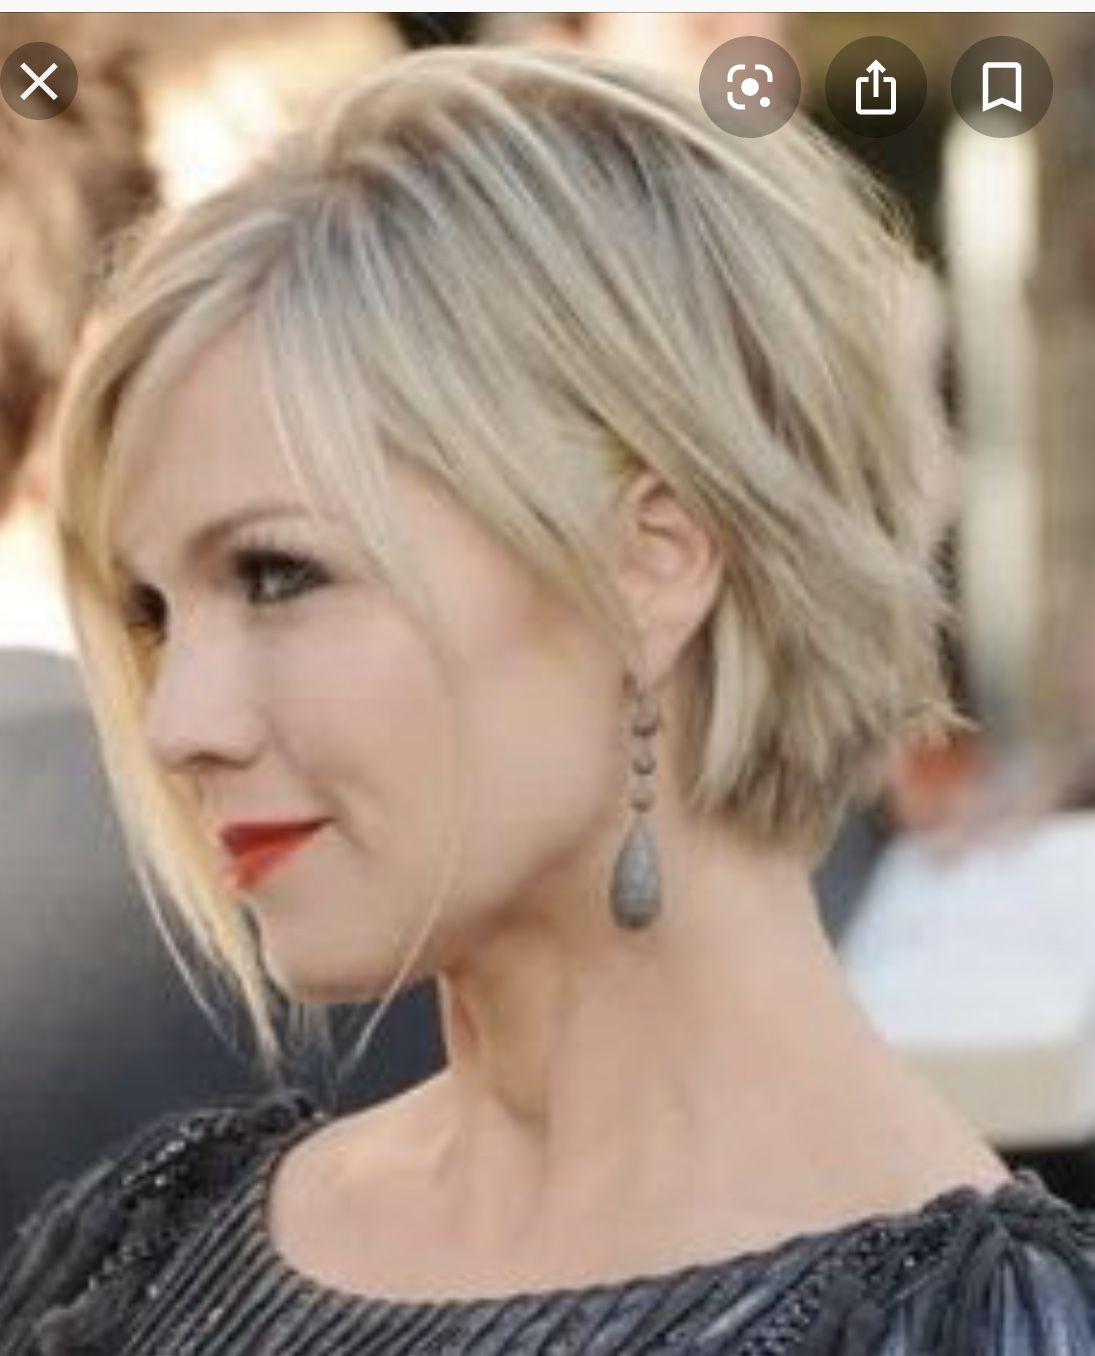 Pin Van Aidan Ivy Op Kapsels In 2020 Bob Kapsel Voor Fijn Haar Kort Carre Kapsel Kapsels Dun Haar